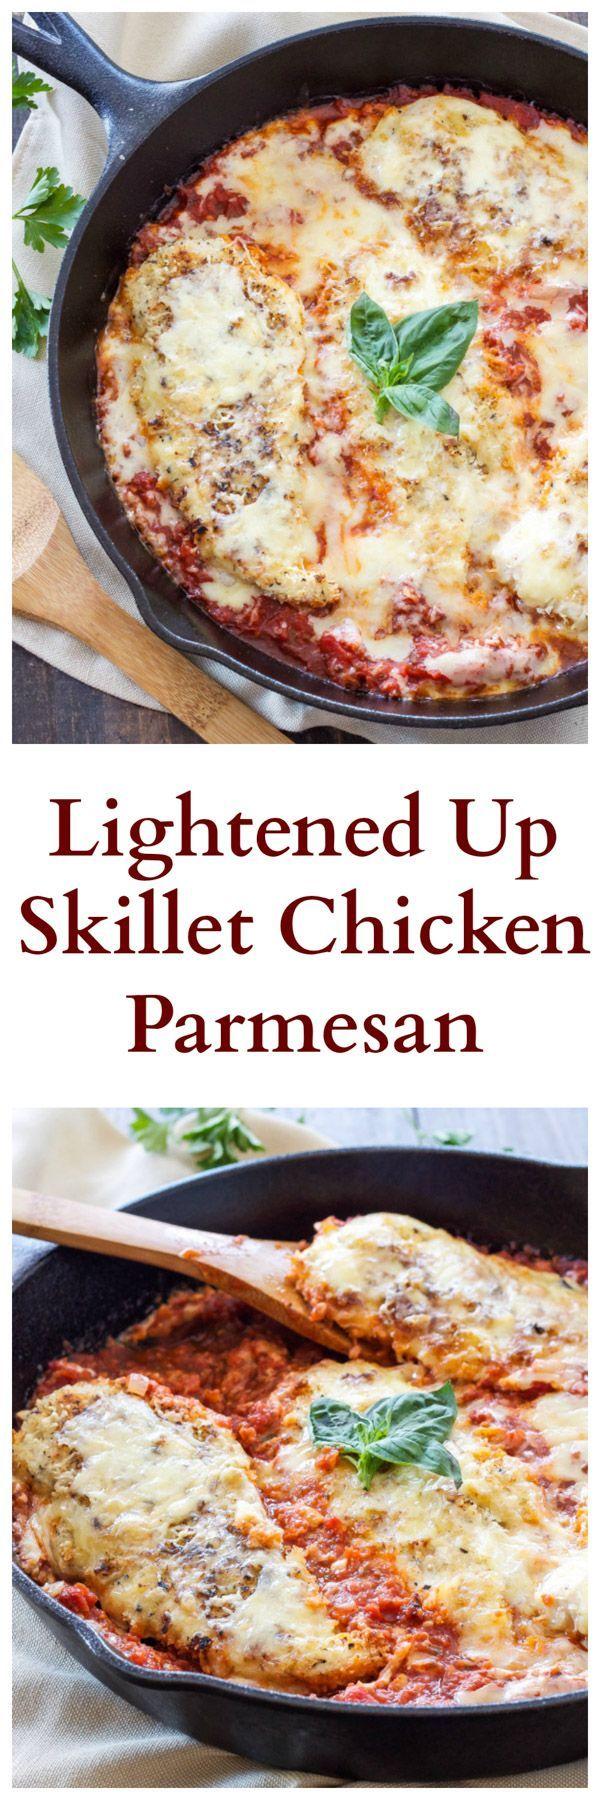 Lightened Up Skillet Chicken Parmesan |